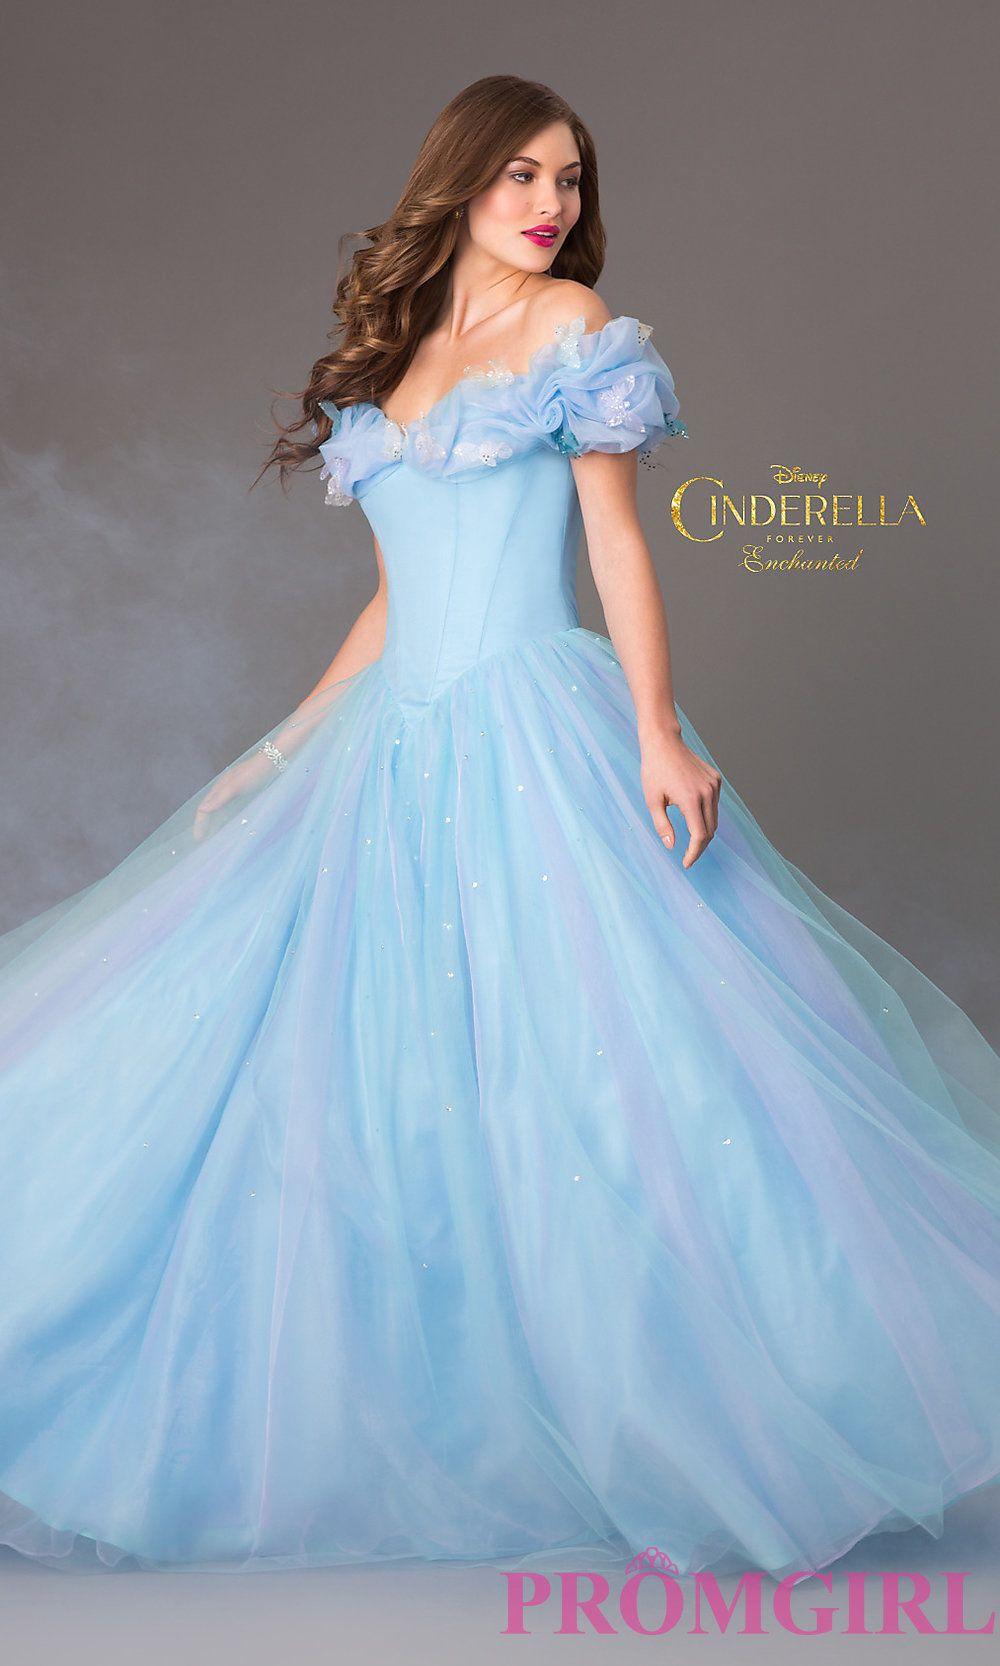 Cinderella dress ❤️  Cinderella prom dress, Blue wedding